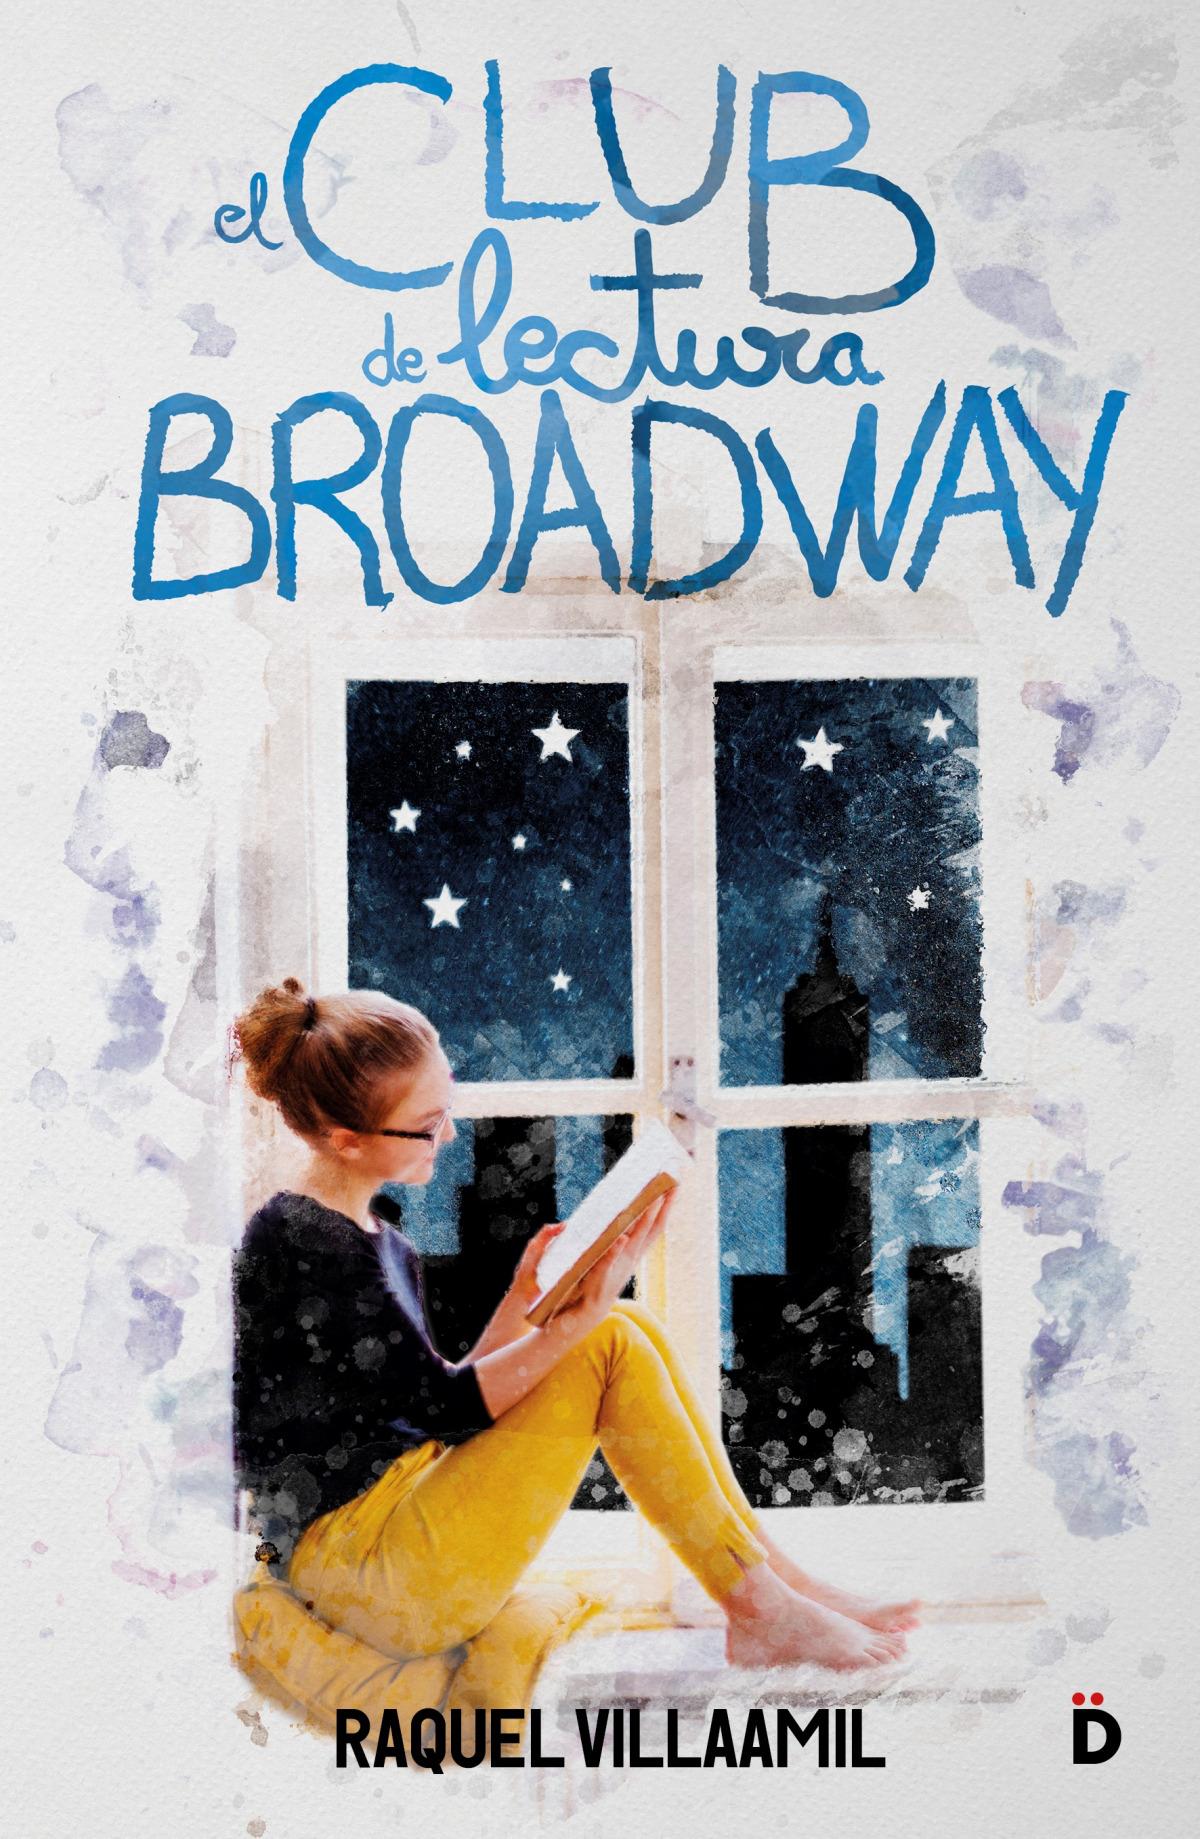 El club de lectura Broadway